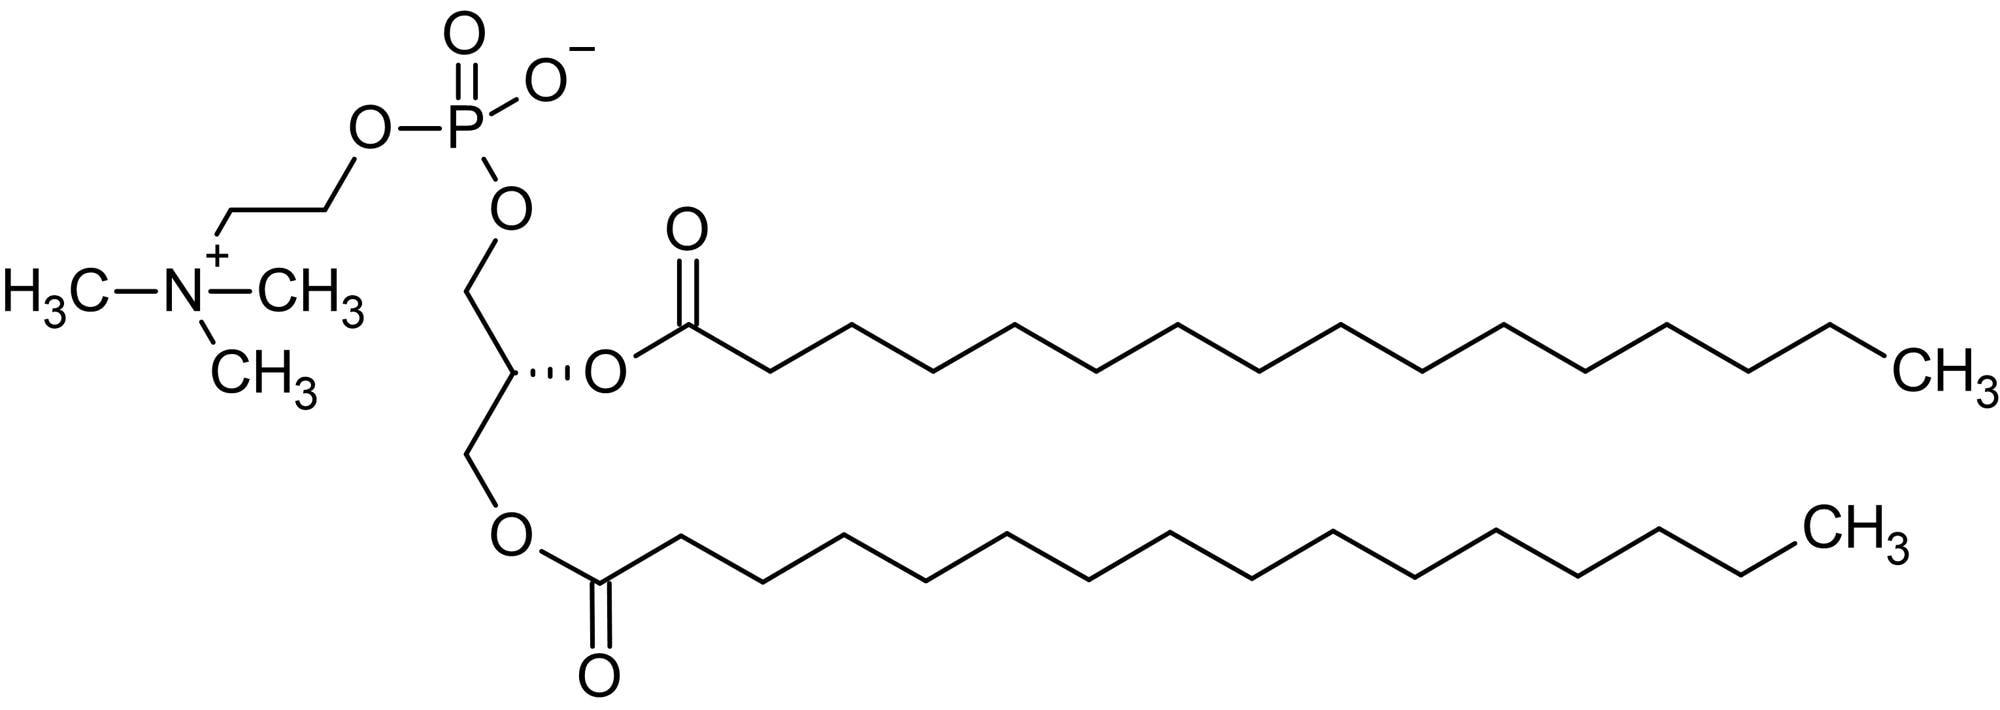 Chemical Structure - 1,2-Dipalmitoyl-sn-glycero-3-phosphorylcholine (DPPC), Phosphatidylcholine (ab143947)